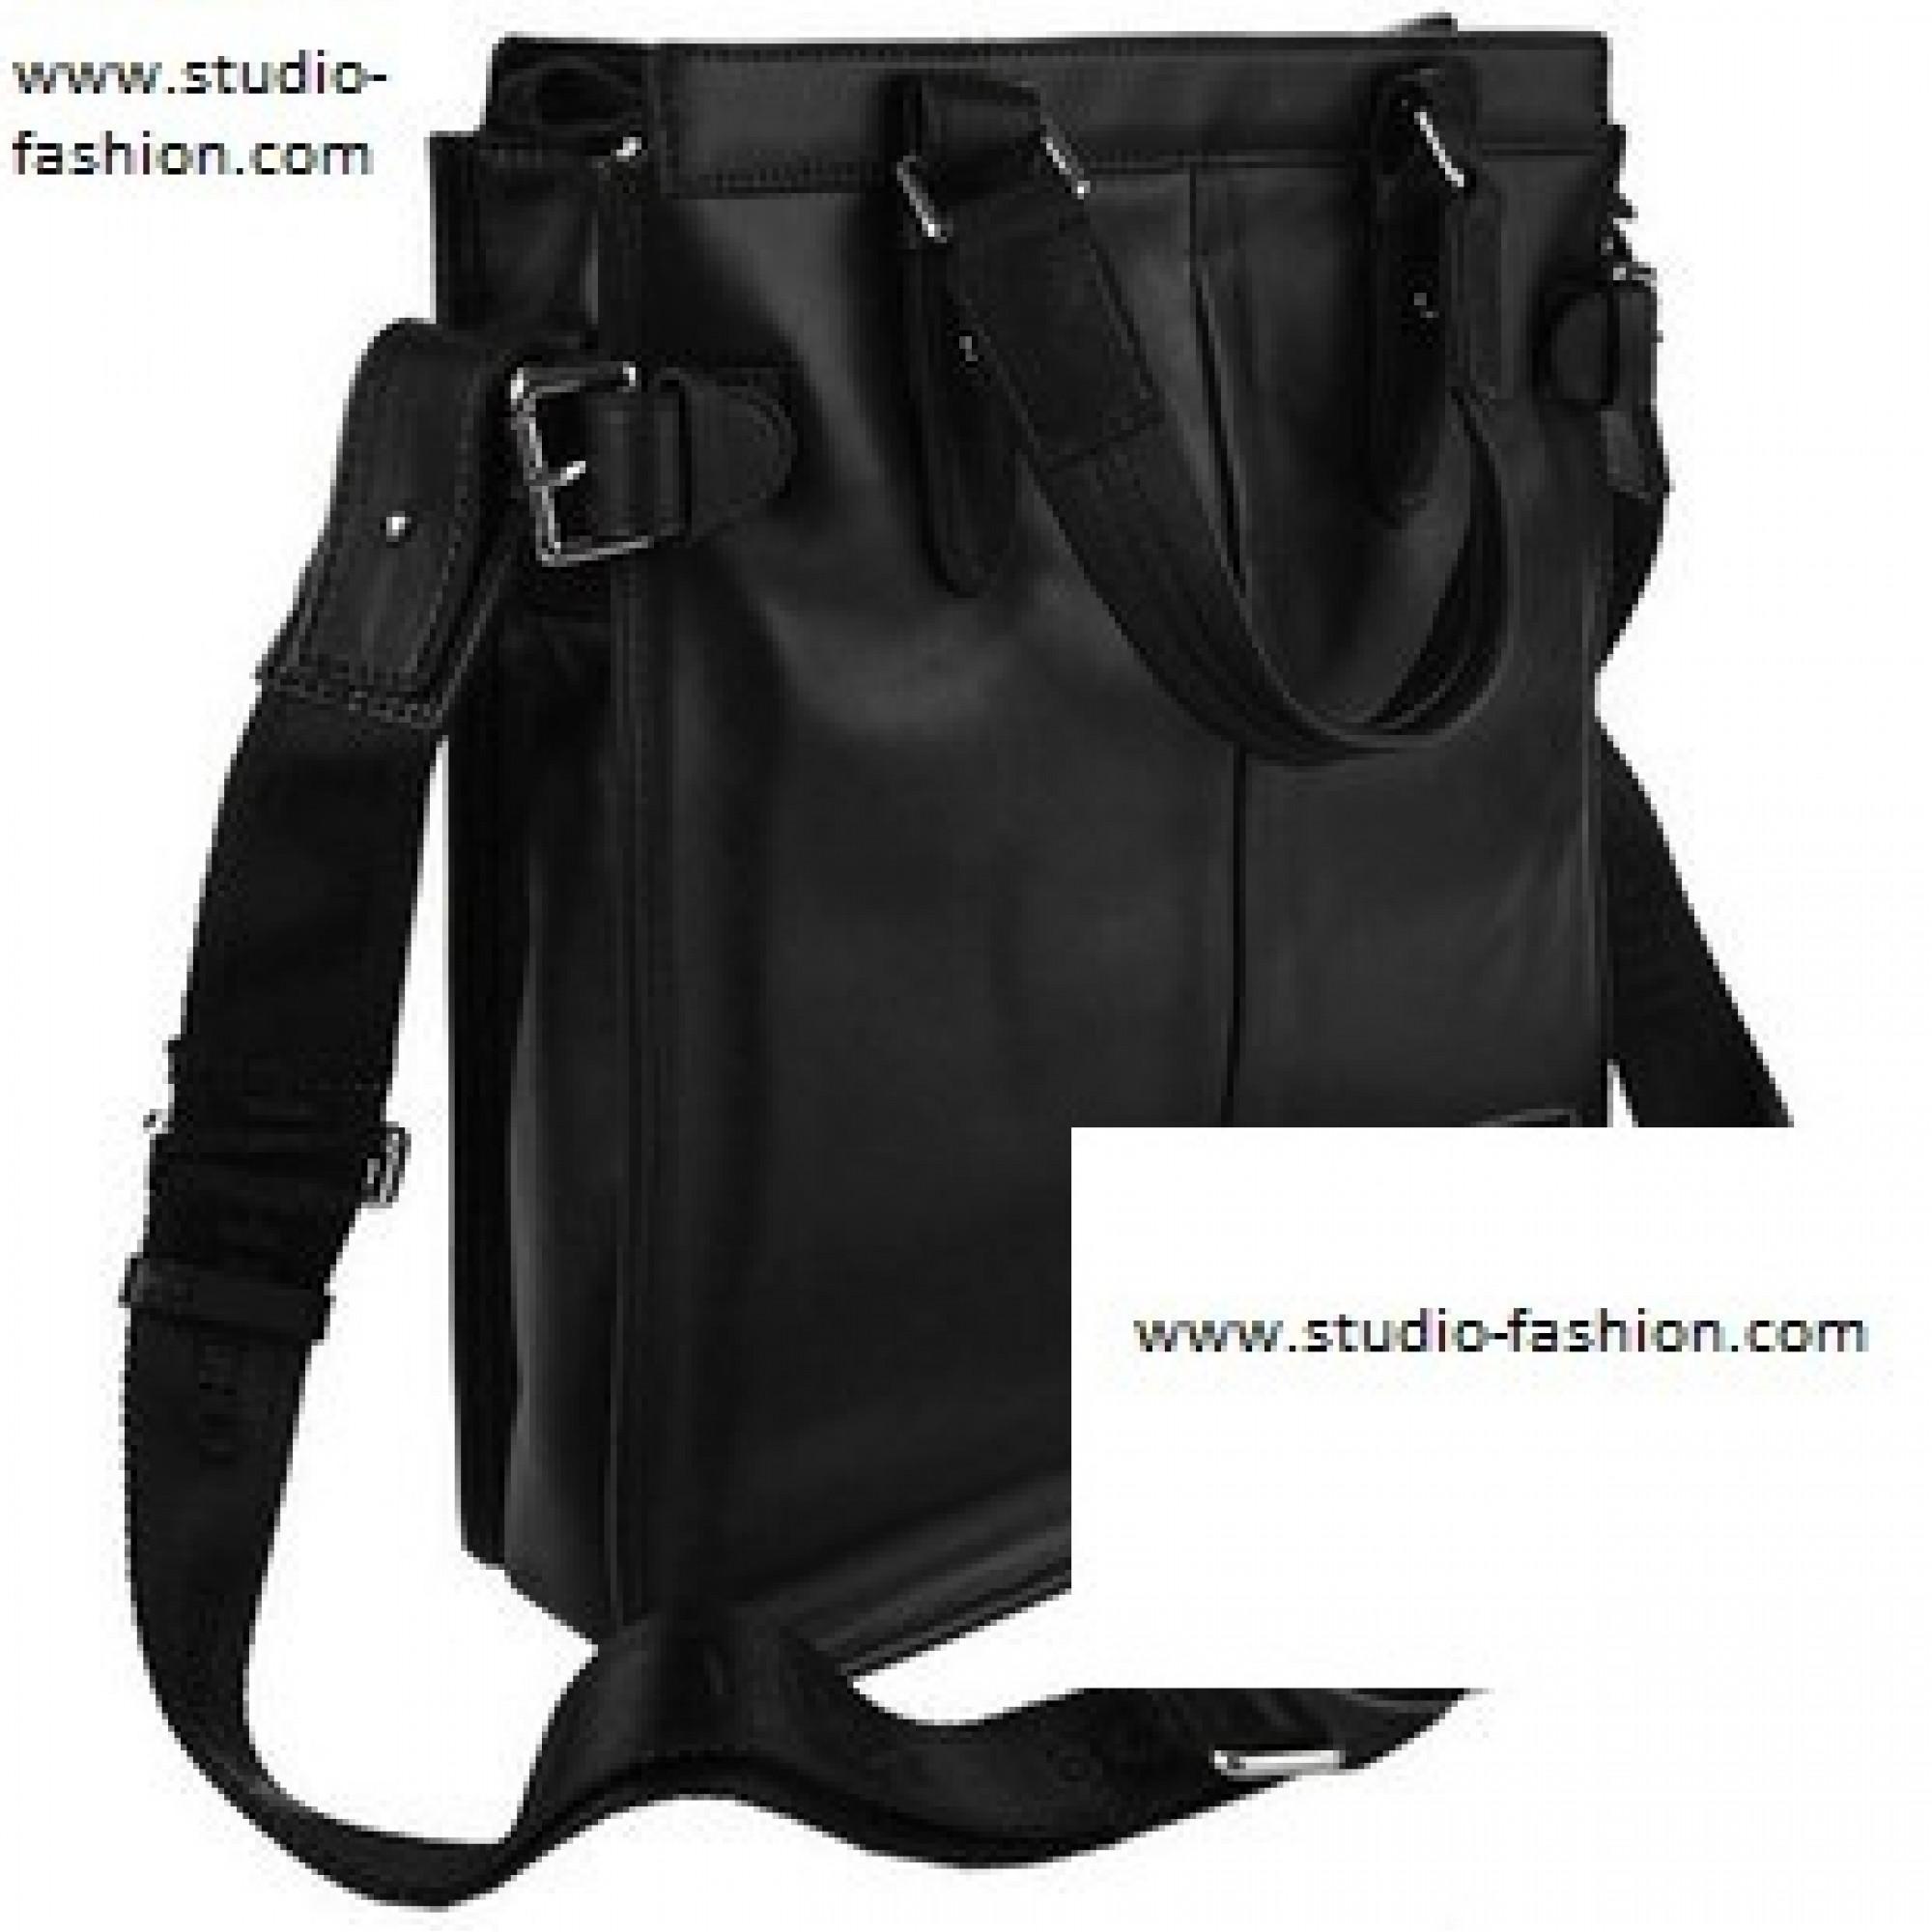 a92e46a16d84 Купить сумка мужская кожаная, черная от Hugo Boss — в Киеве, код ...